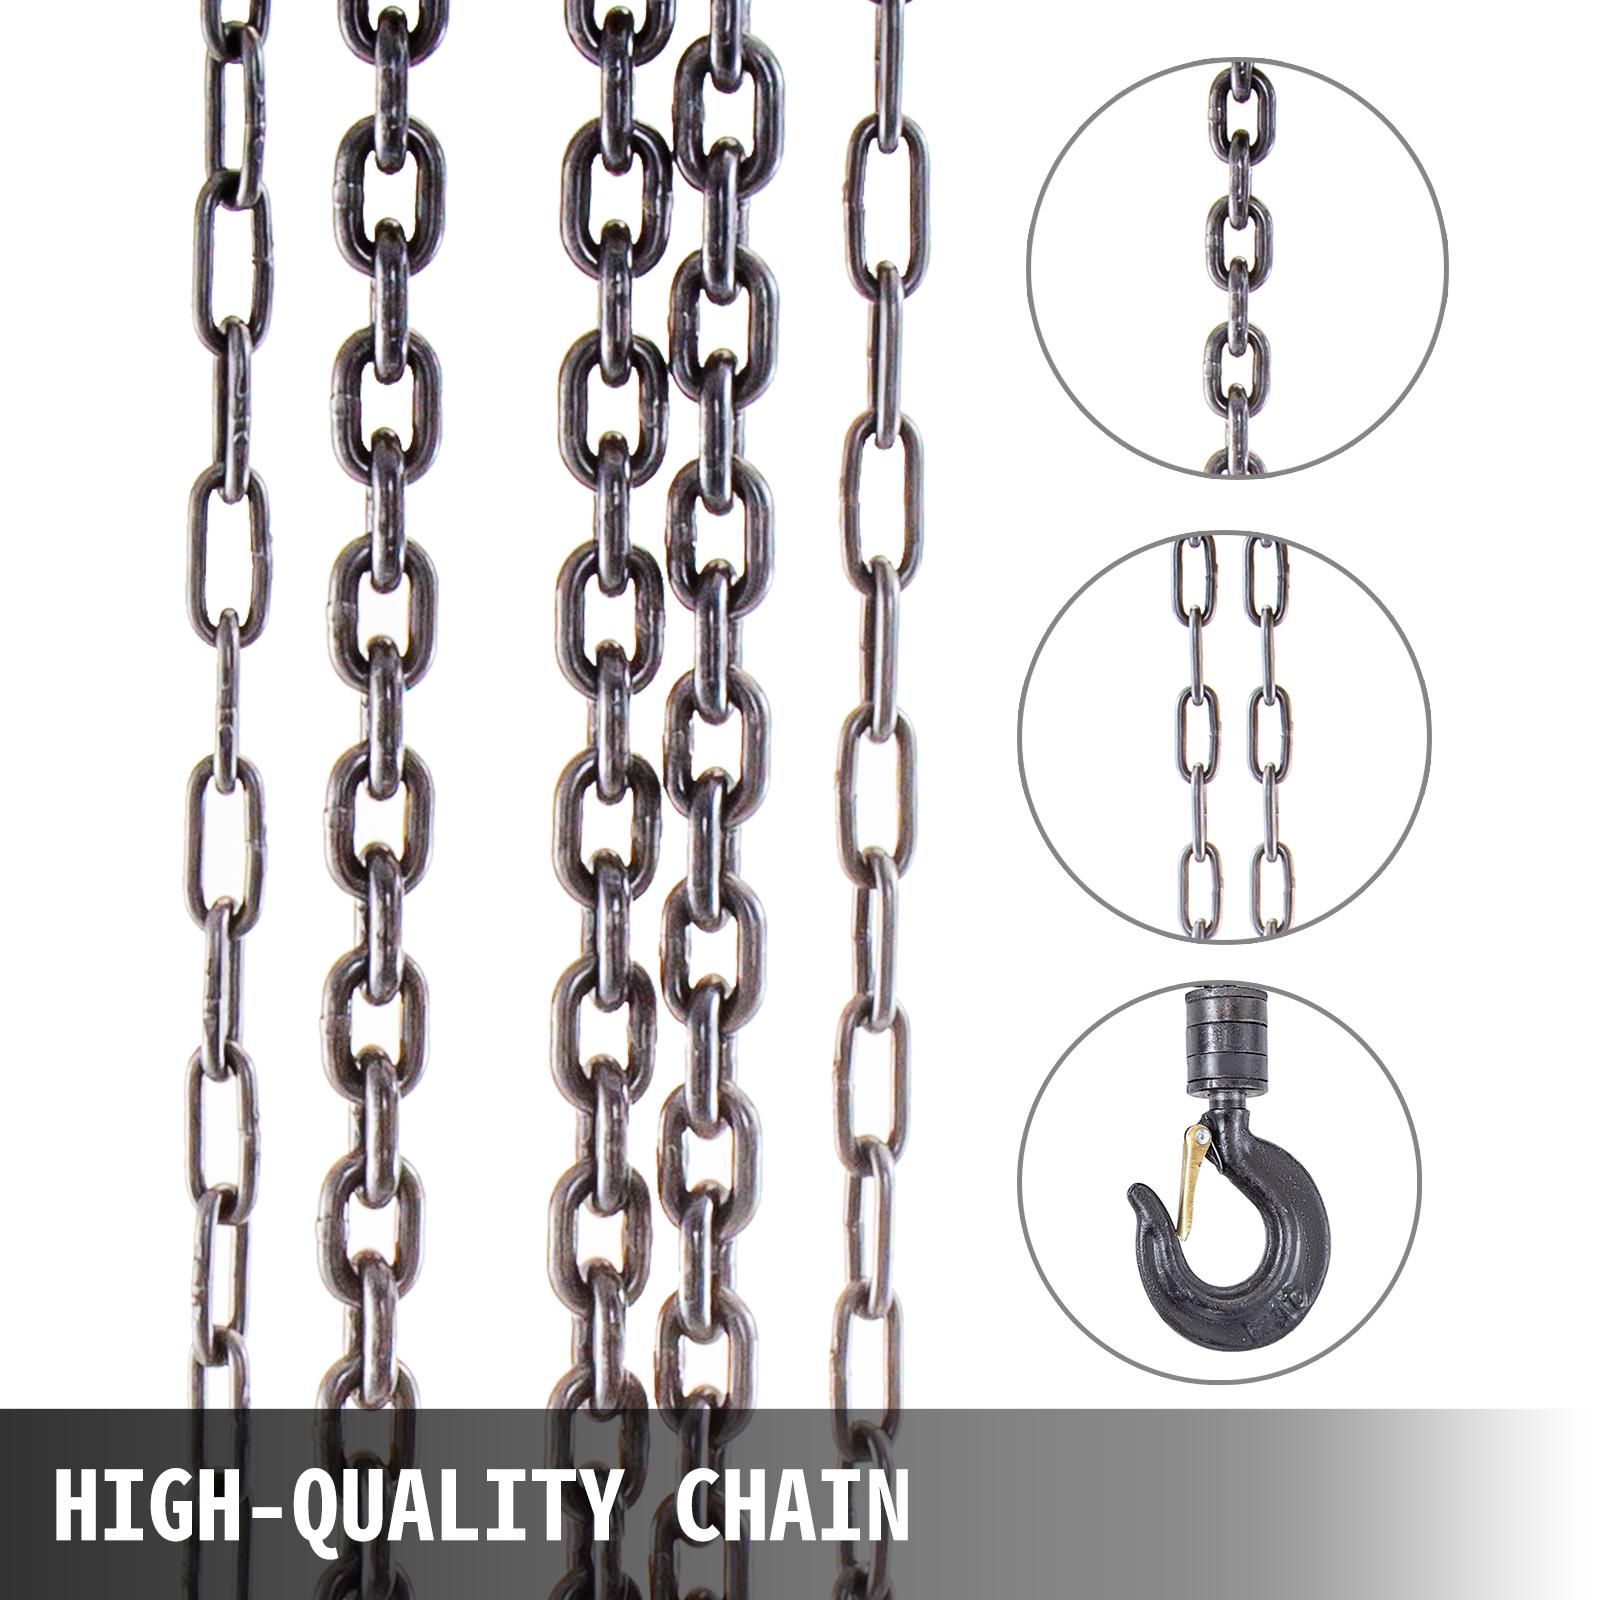 Cranes & Hoists Chain Hoist Chain Block Hoist 11000lbs/5ton,Manual ...